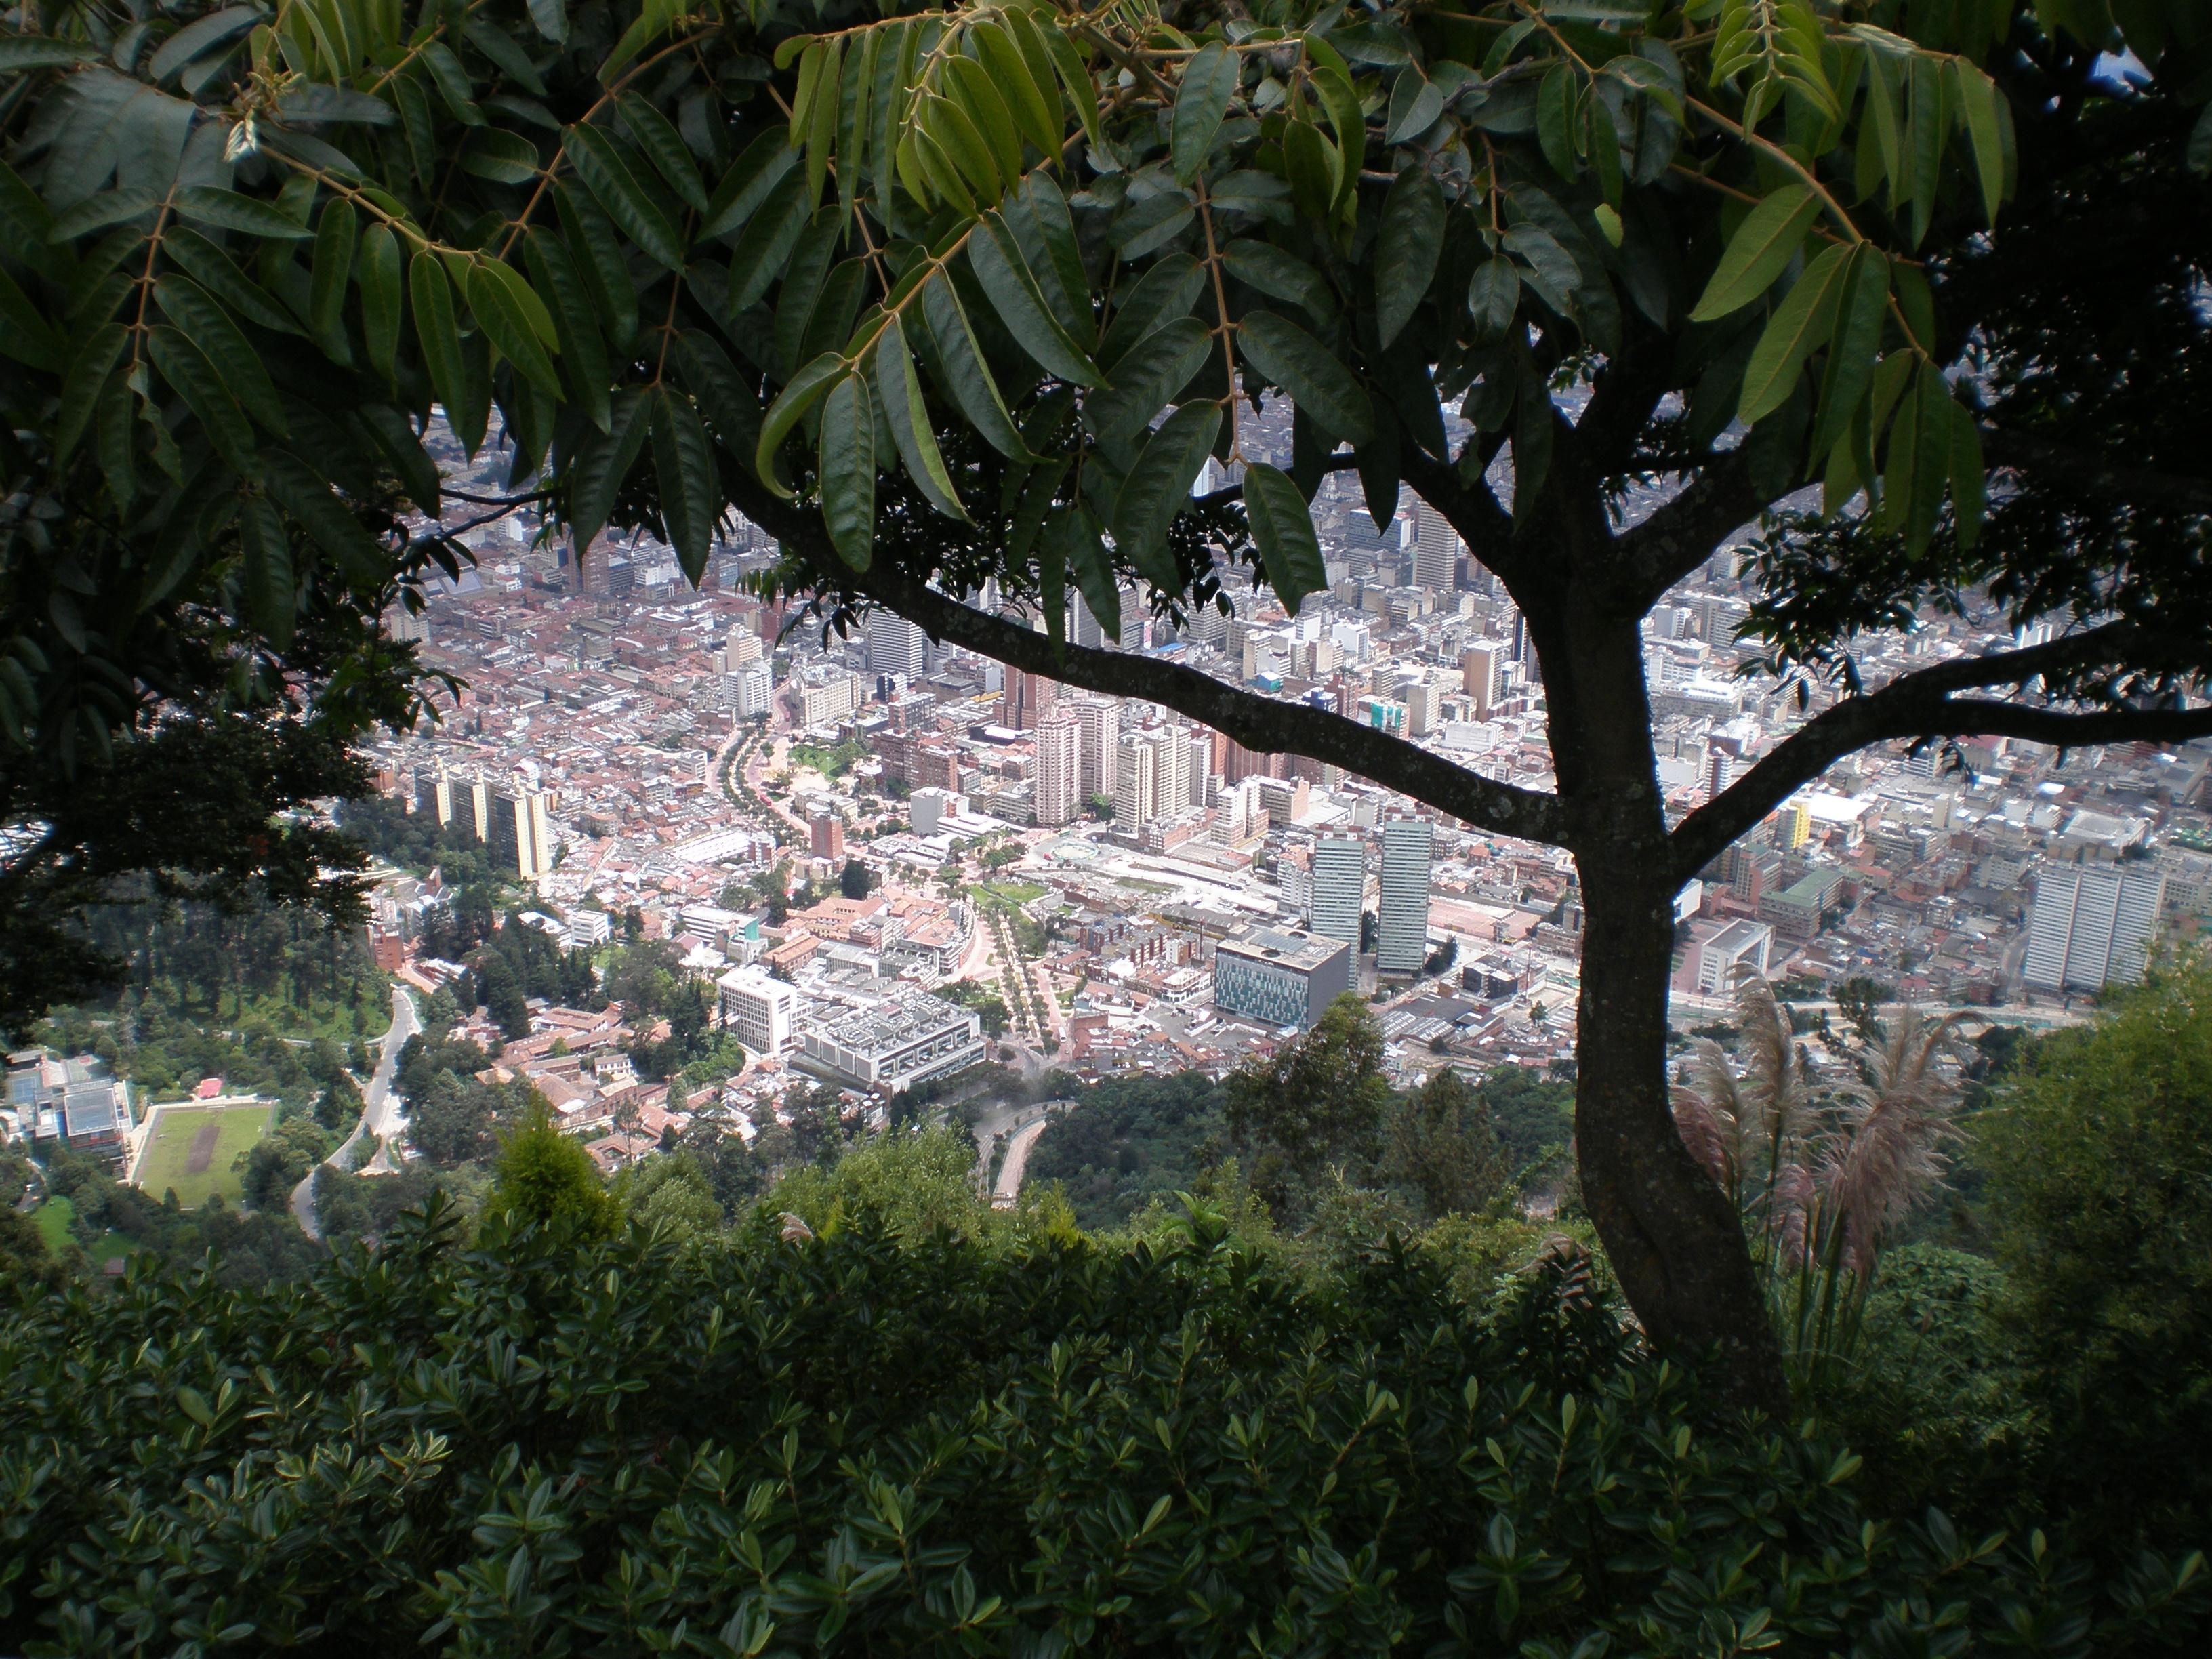 Monserrate in Bogota